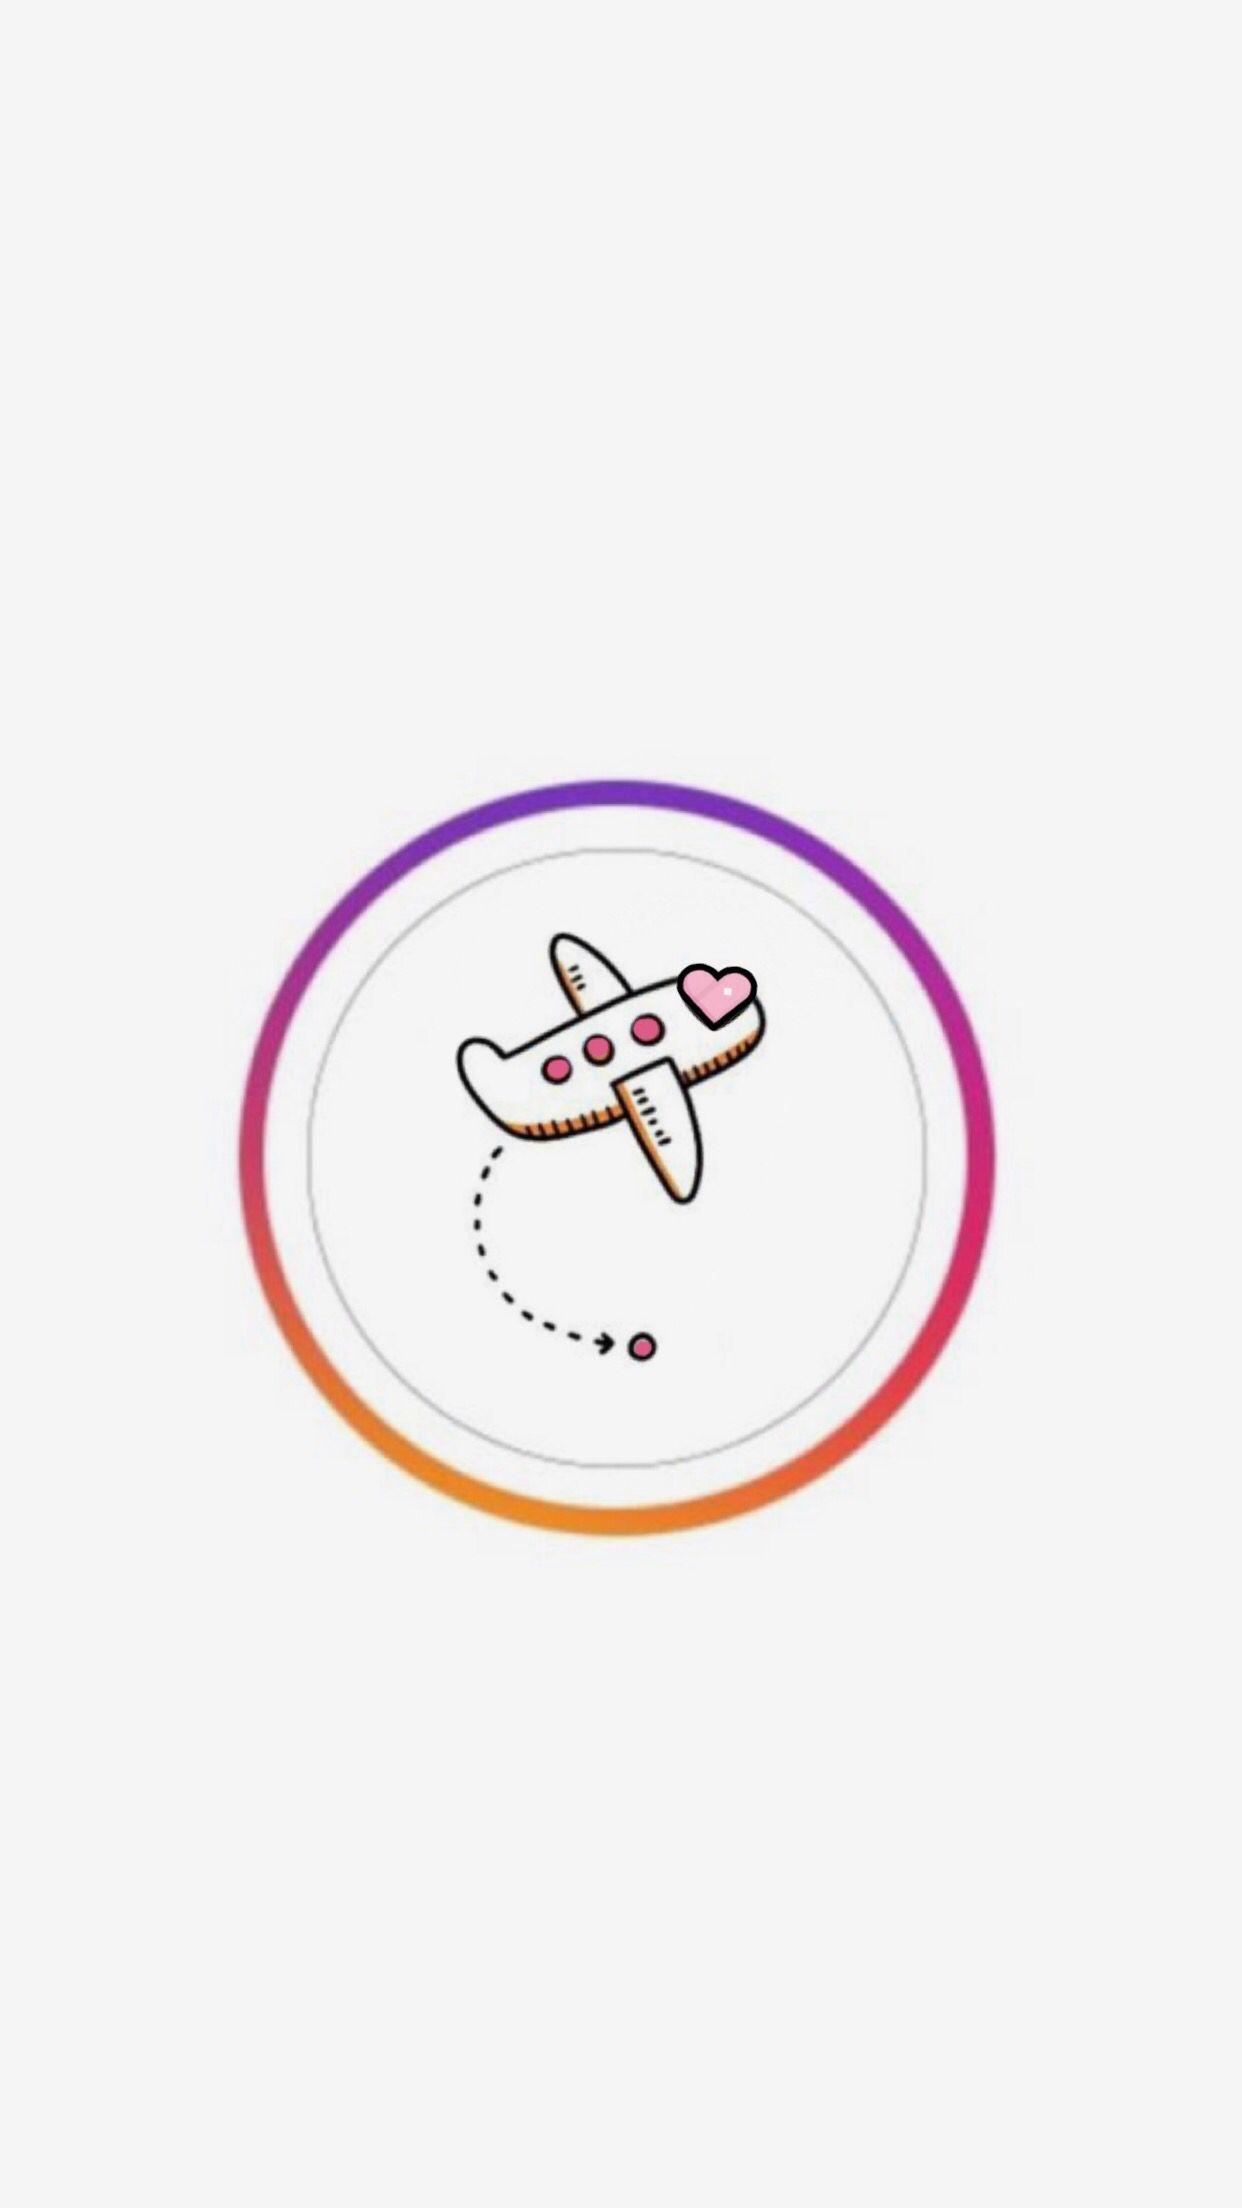 Pin de Anne Bakkejord em Instagram highlight icons | Logotipo instagram,  Ideias instagram, Ícones do instagram